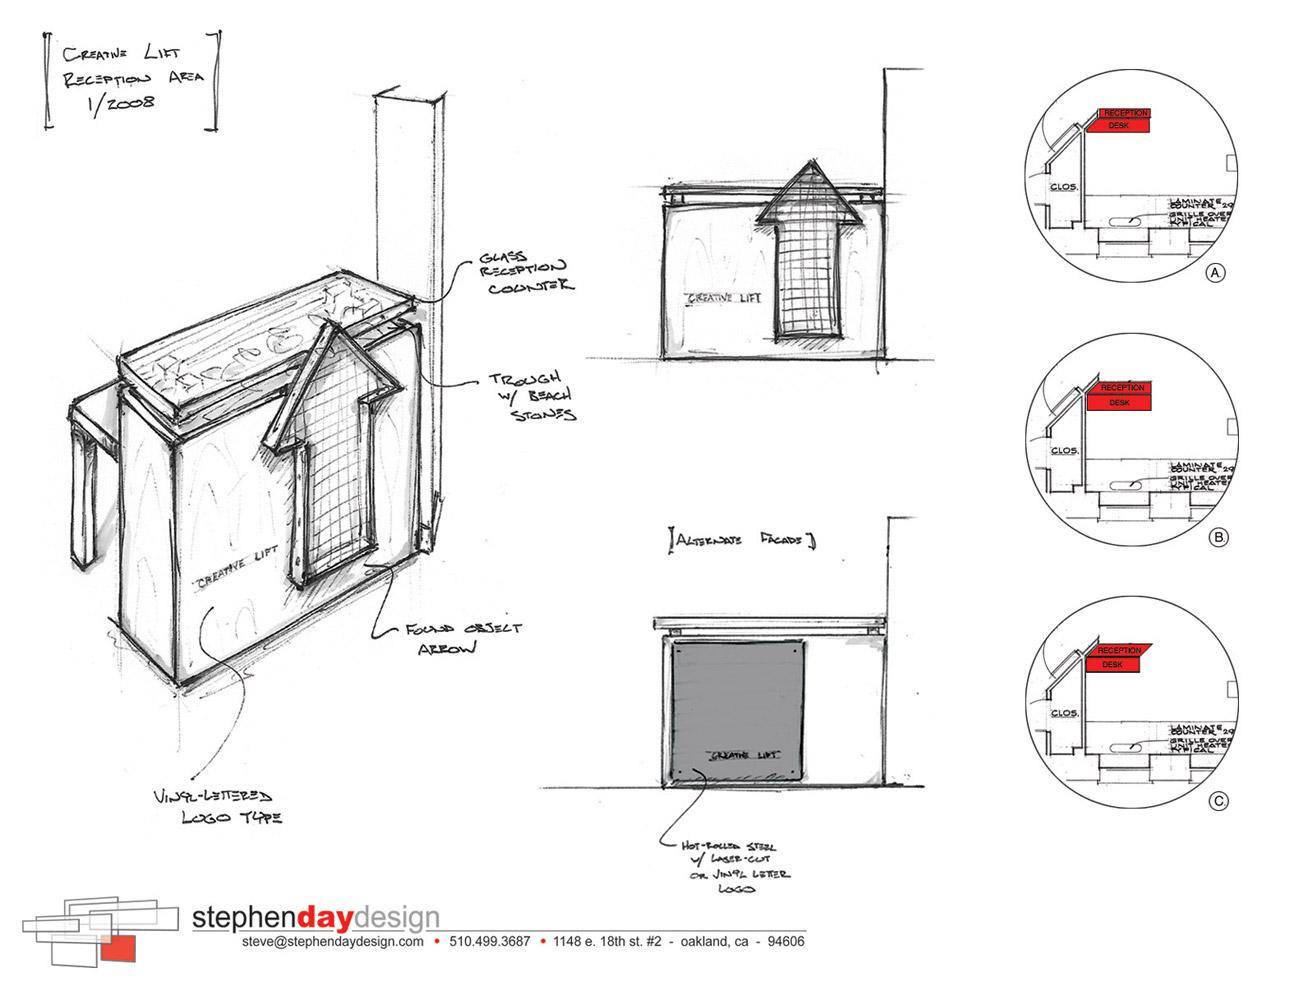 Stephen day design for Table design sketch